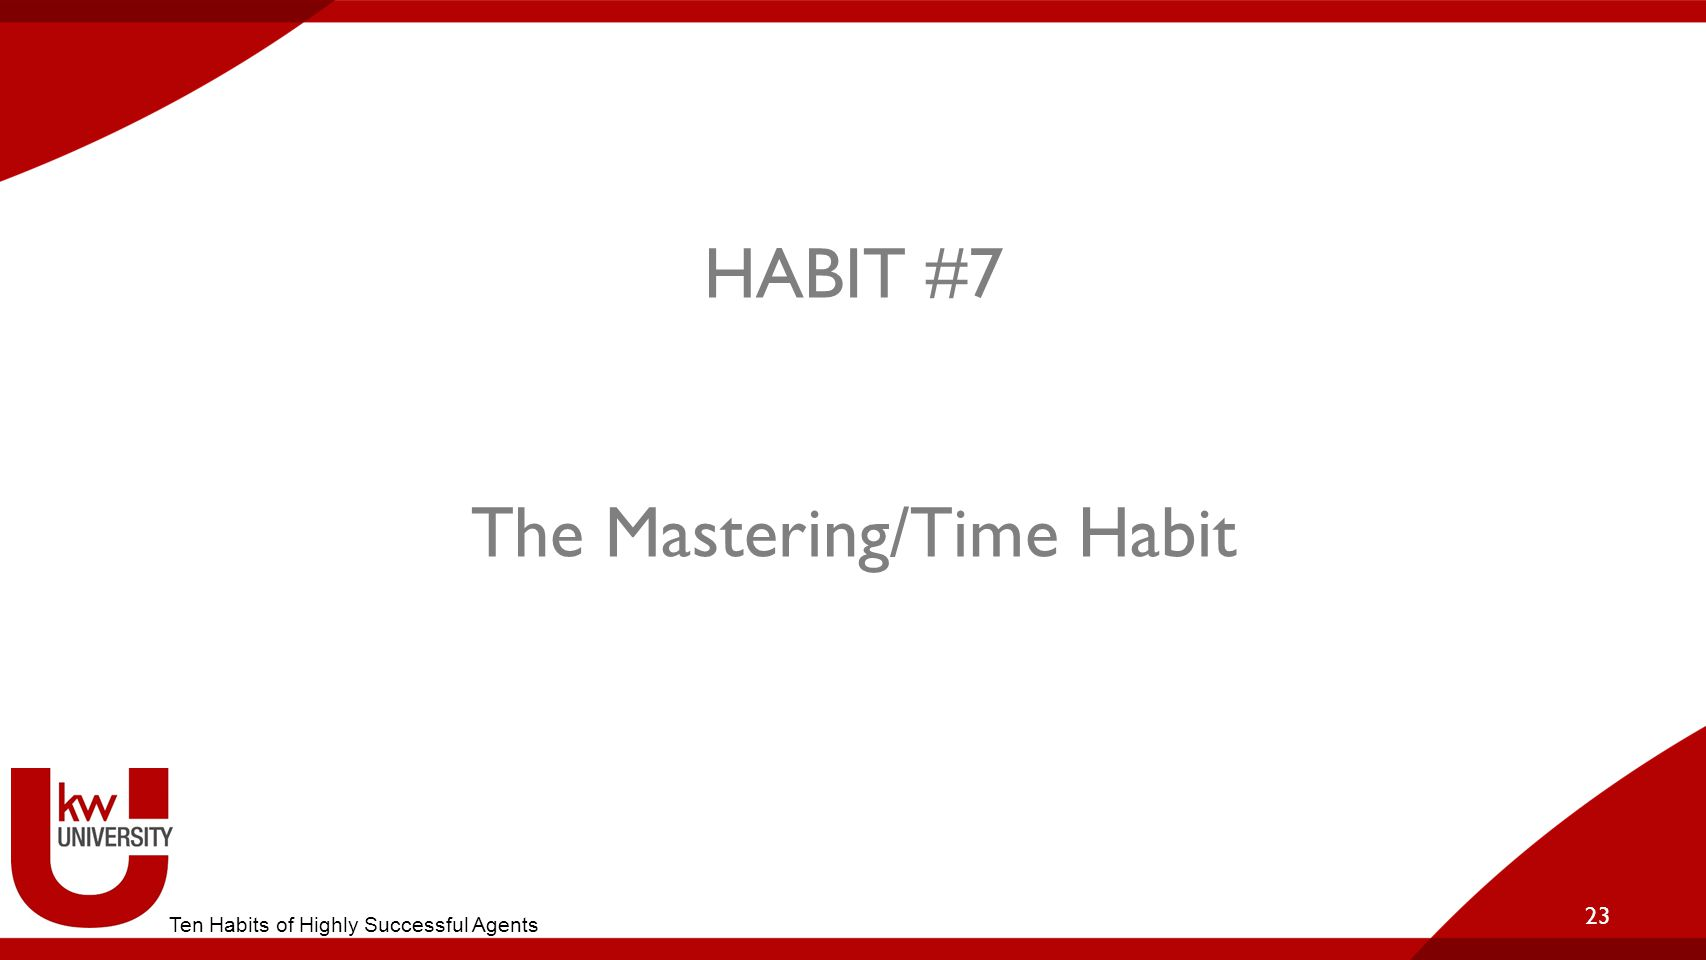 HABIT #7 The Mastering/Time Habit